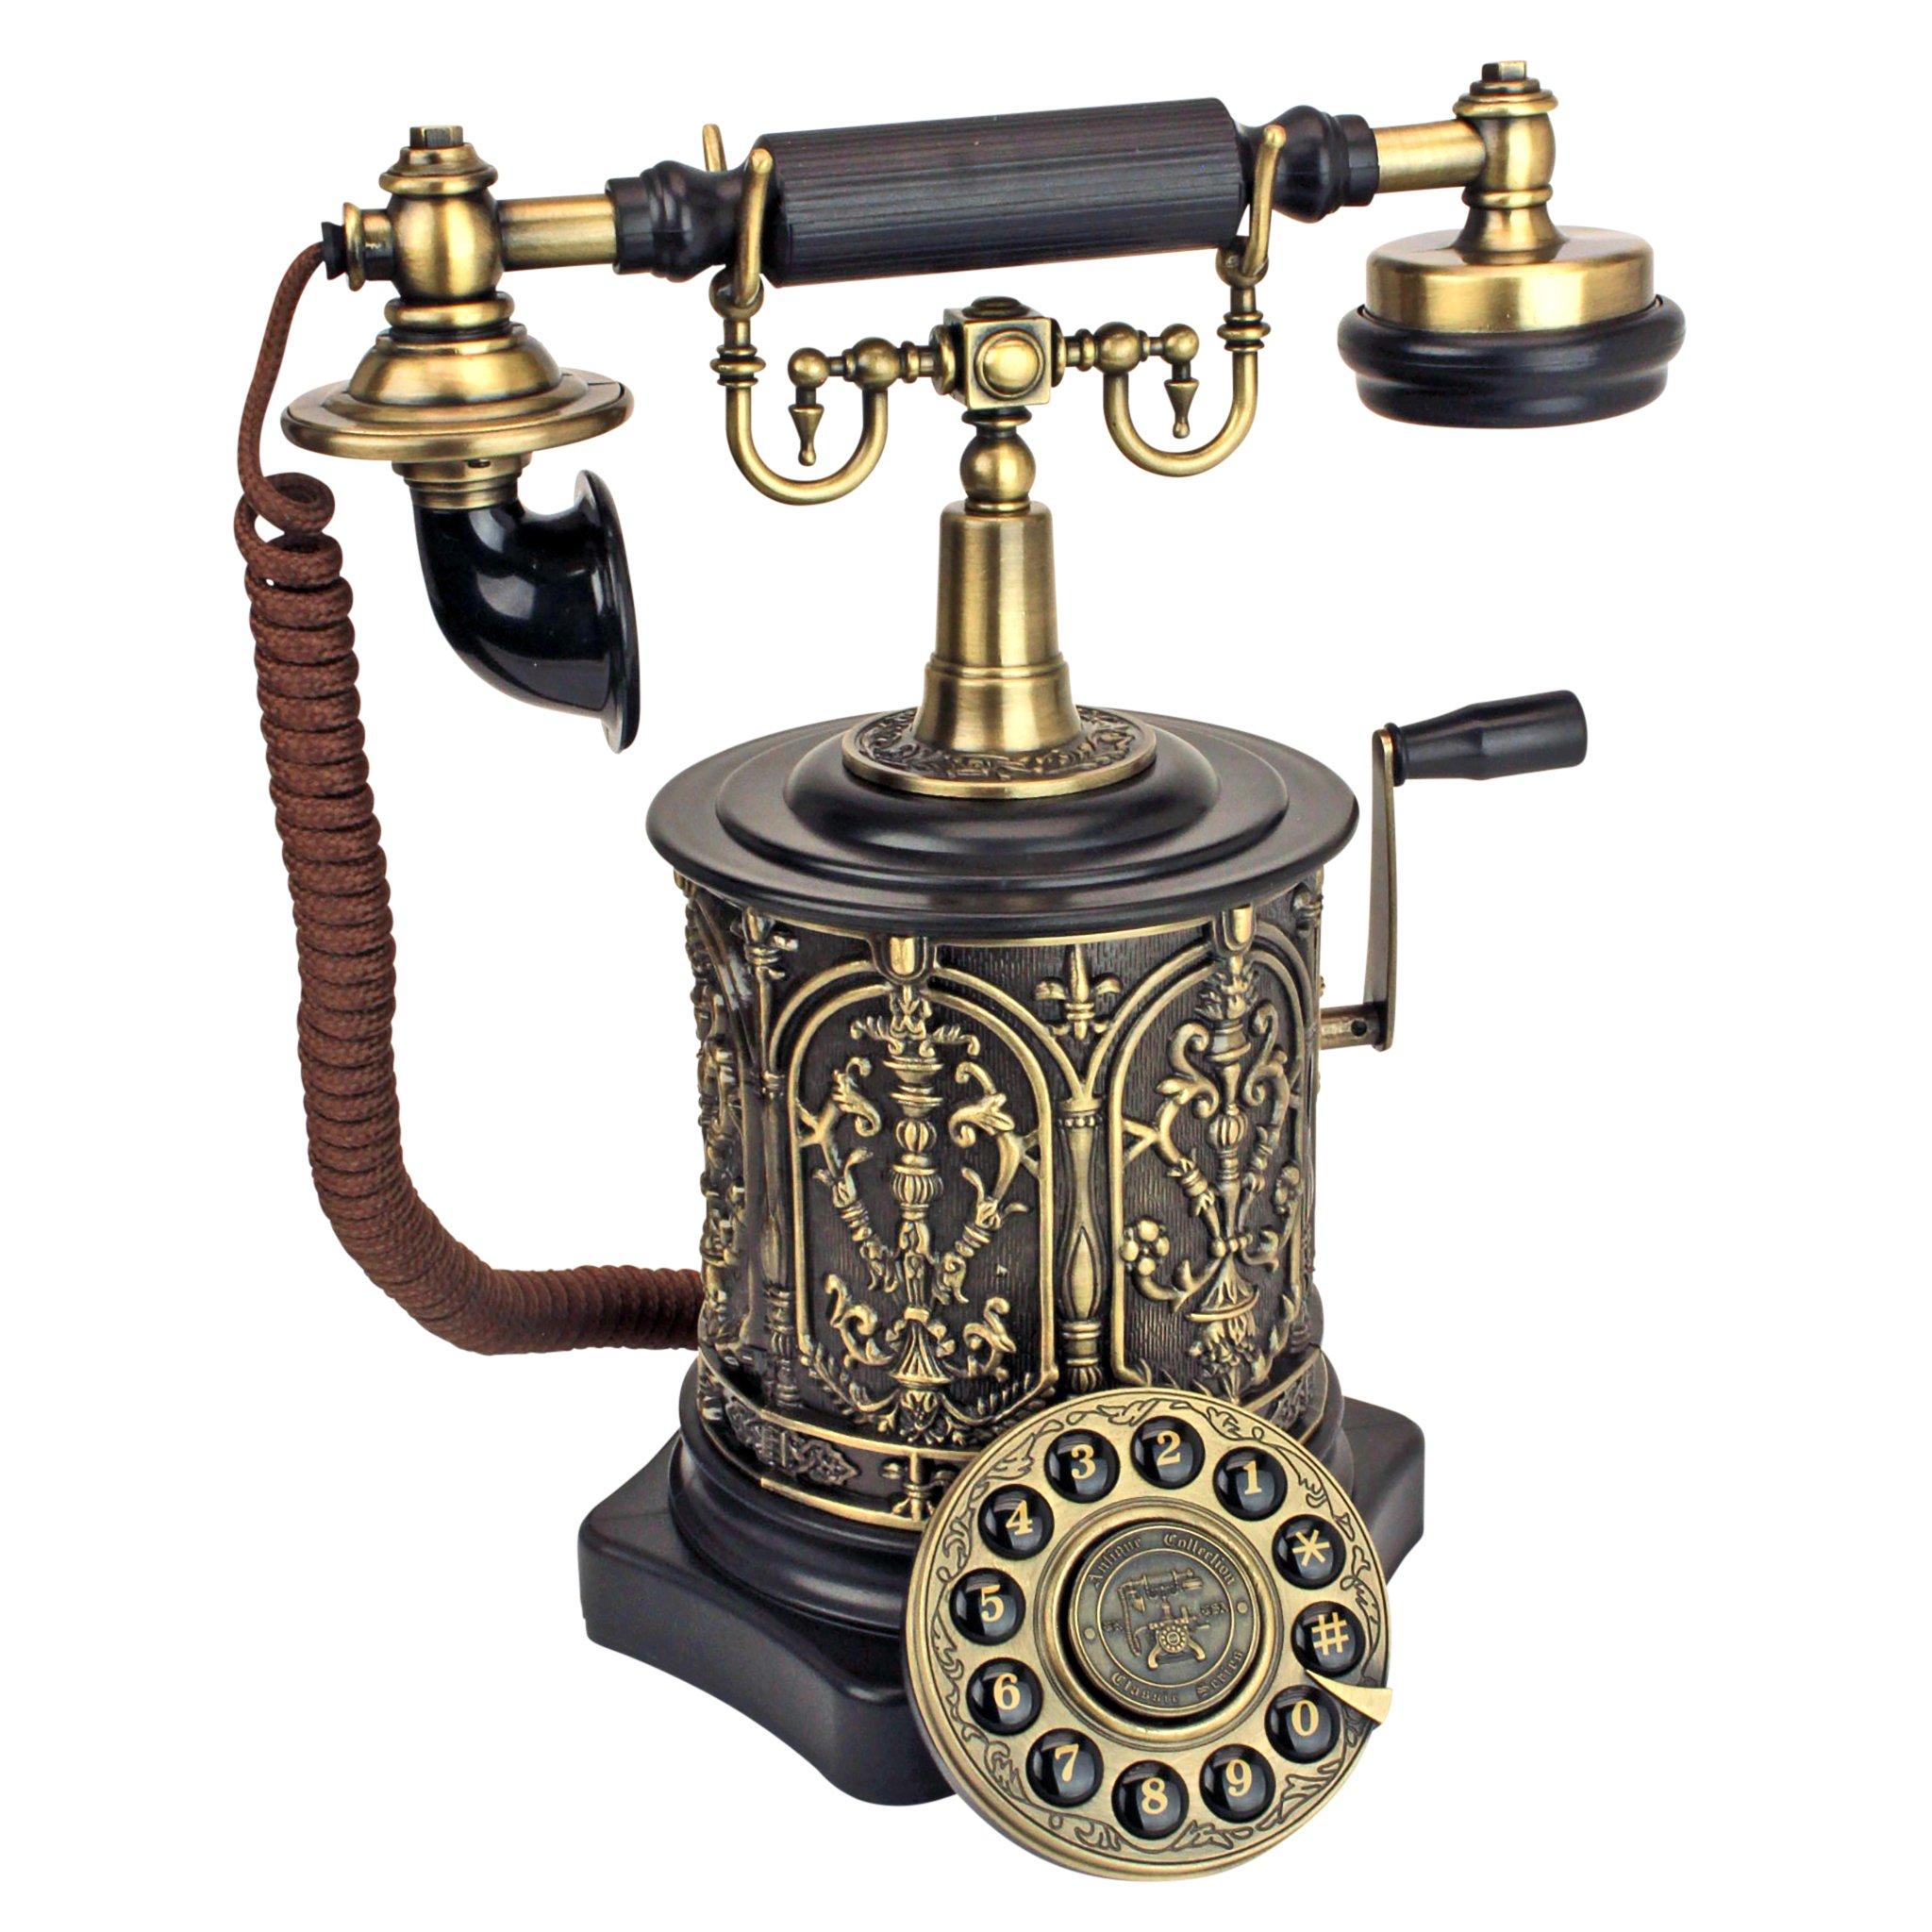 Design Toscano Antique Phone - The Swedish Royal Family 1893 Rotary Telephone - Corded Retro Phone - Vintage Decorative Telephones by Design Toscano